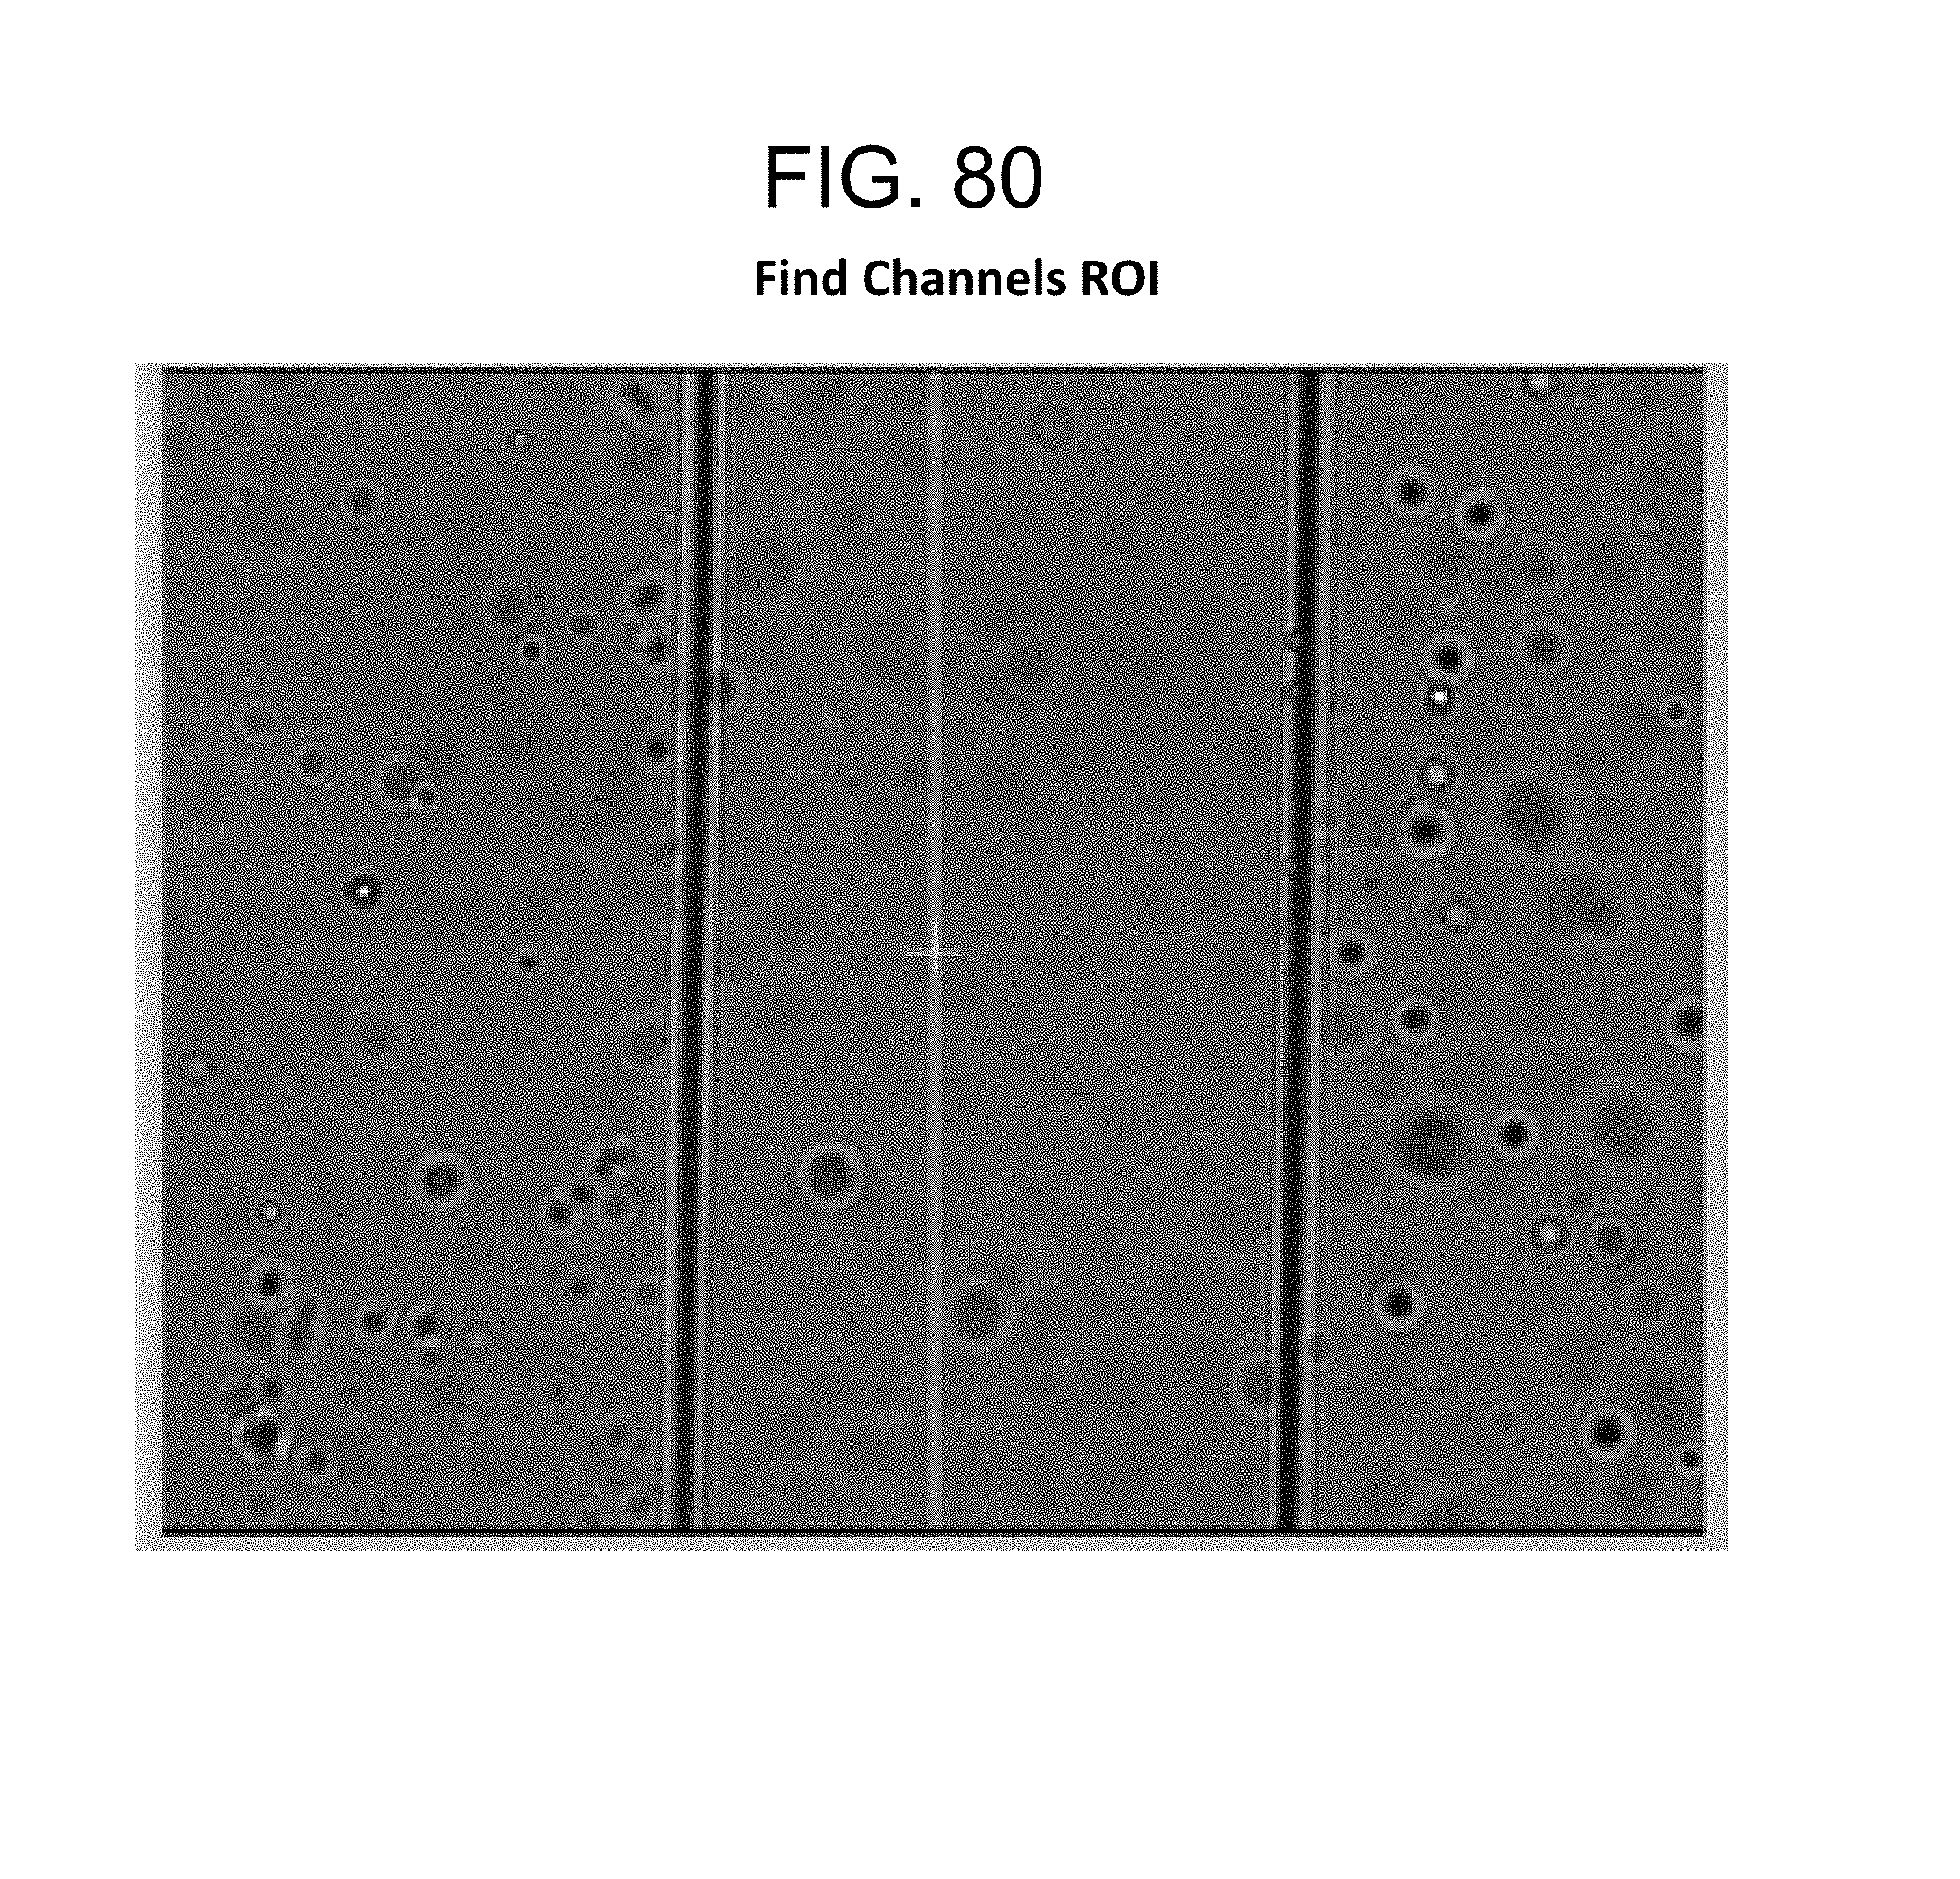 Patent US 10,022,696 B2